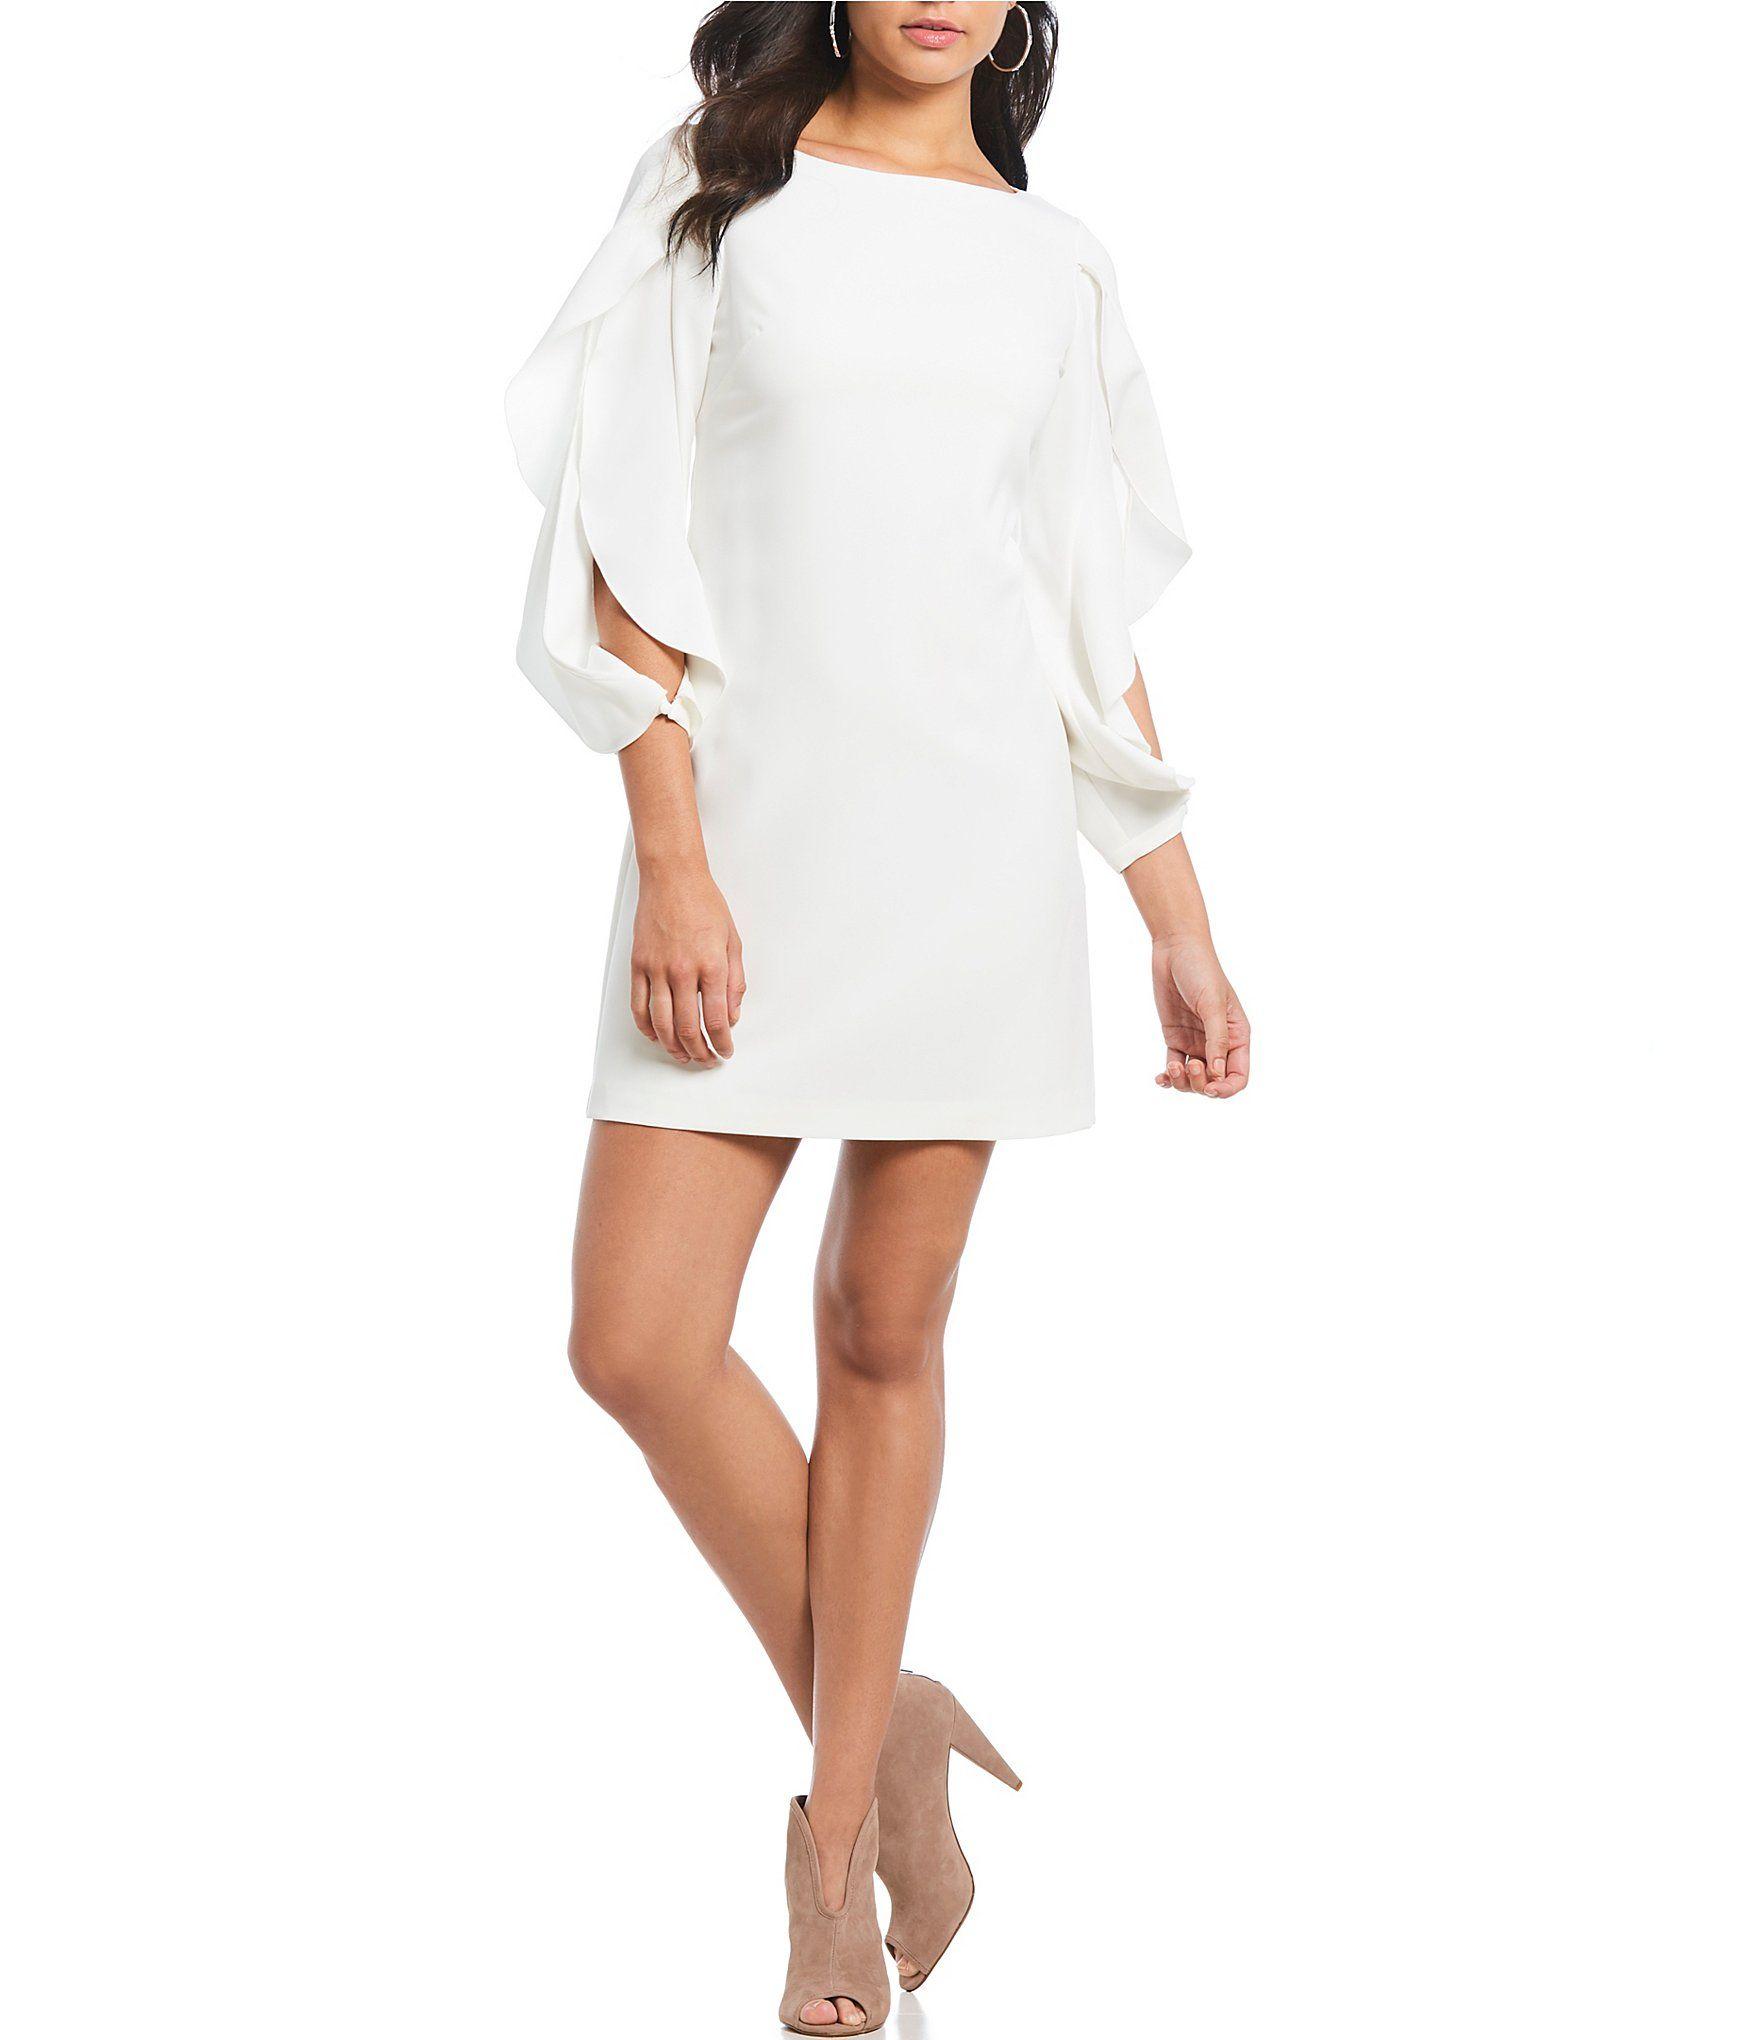 710329ee50 Advertisement  Shop for Vince Camuto Ruffle Split Sleeve Shift Dress at  Dillards.com. Visit Dillards